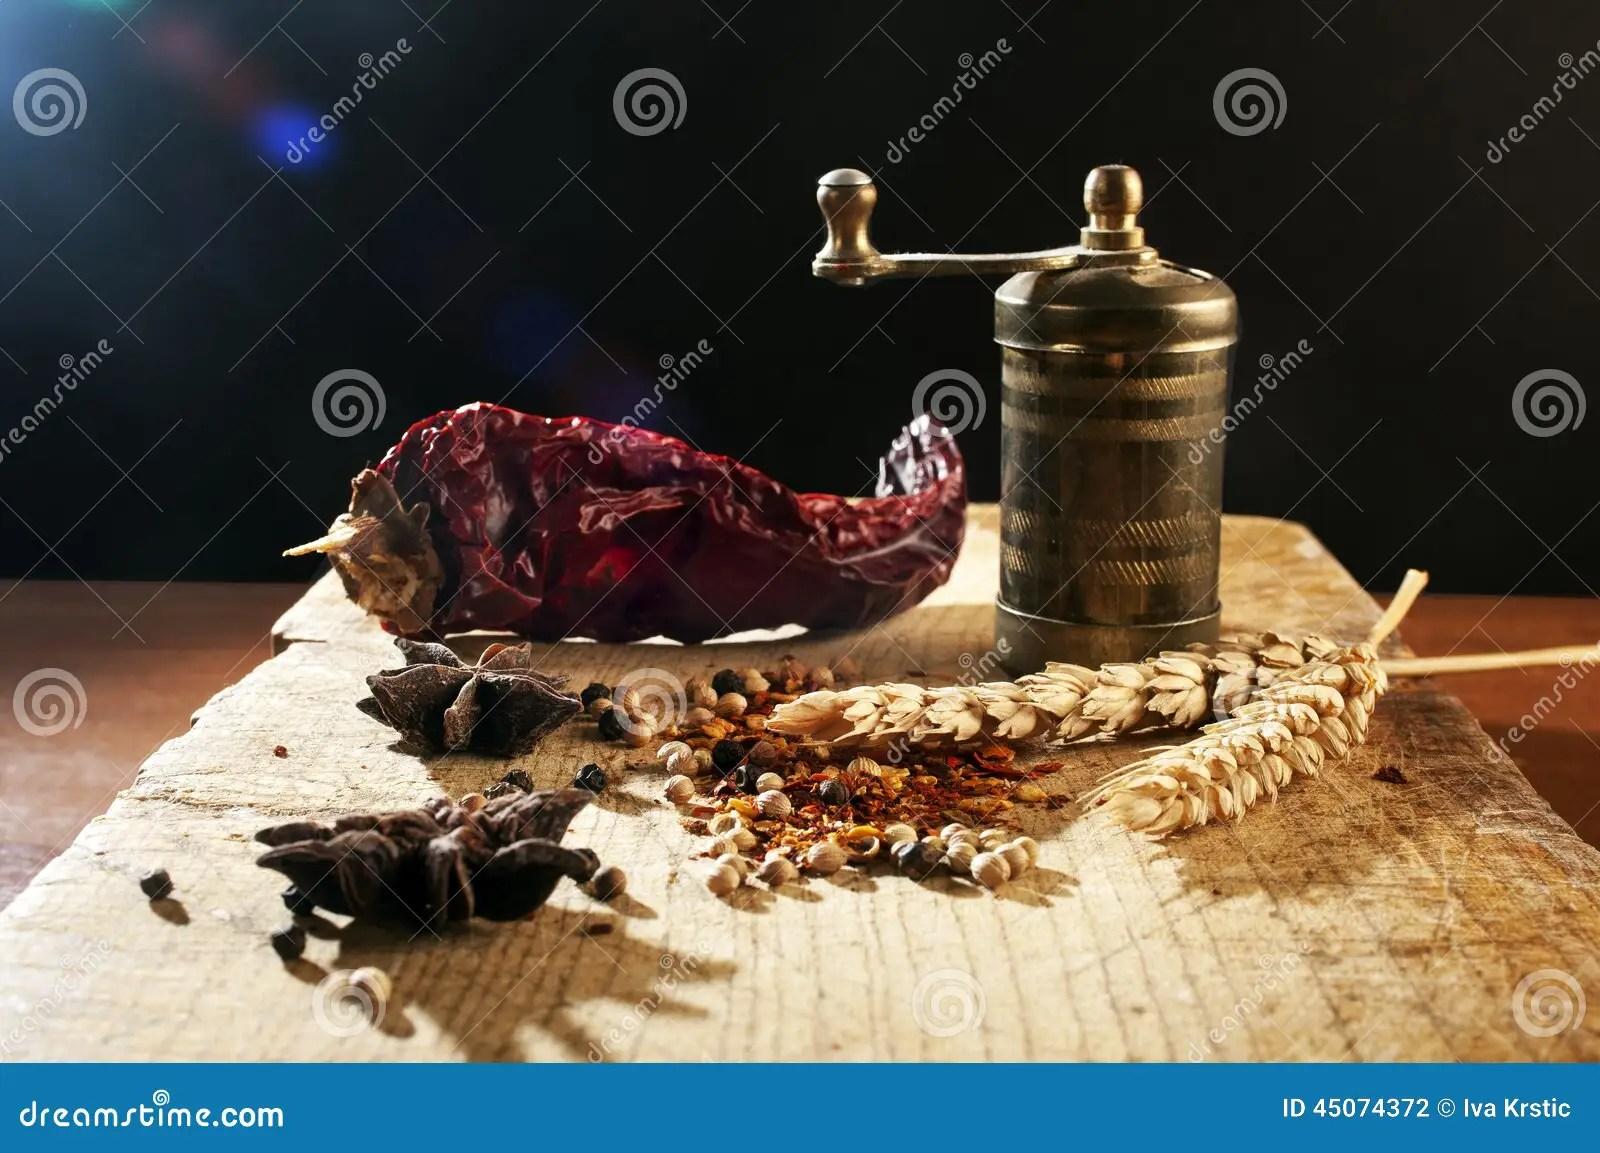 kitchen aid grinder refurbished table and chairs 葡萄酒研磨机用香料库存照片 图片包括有食物 原封 美食 芬芳 美味 葡萄酒研磨机用香料